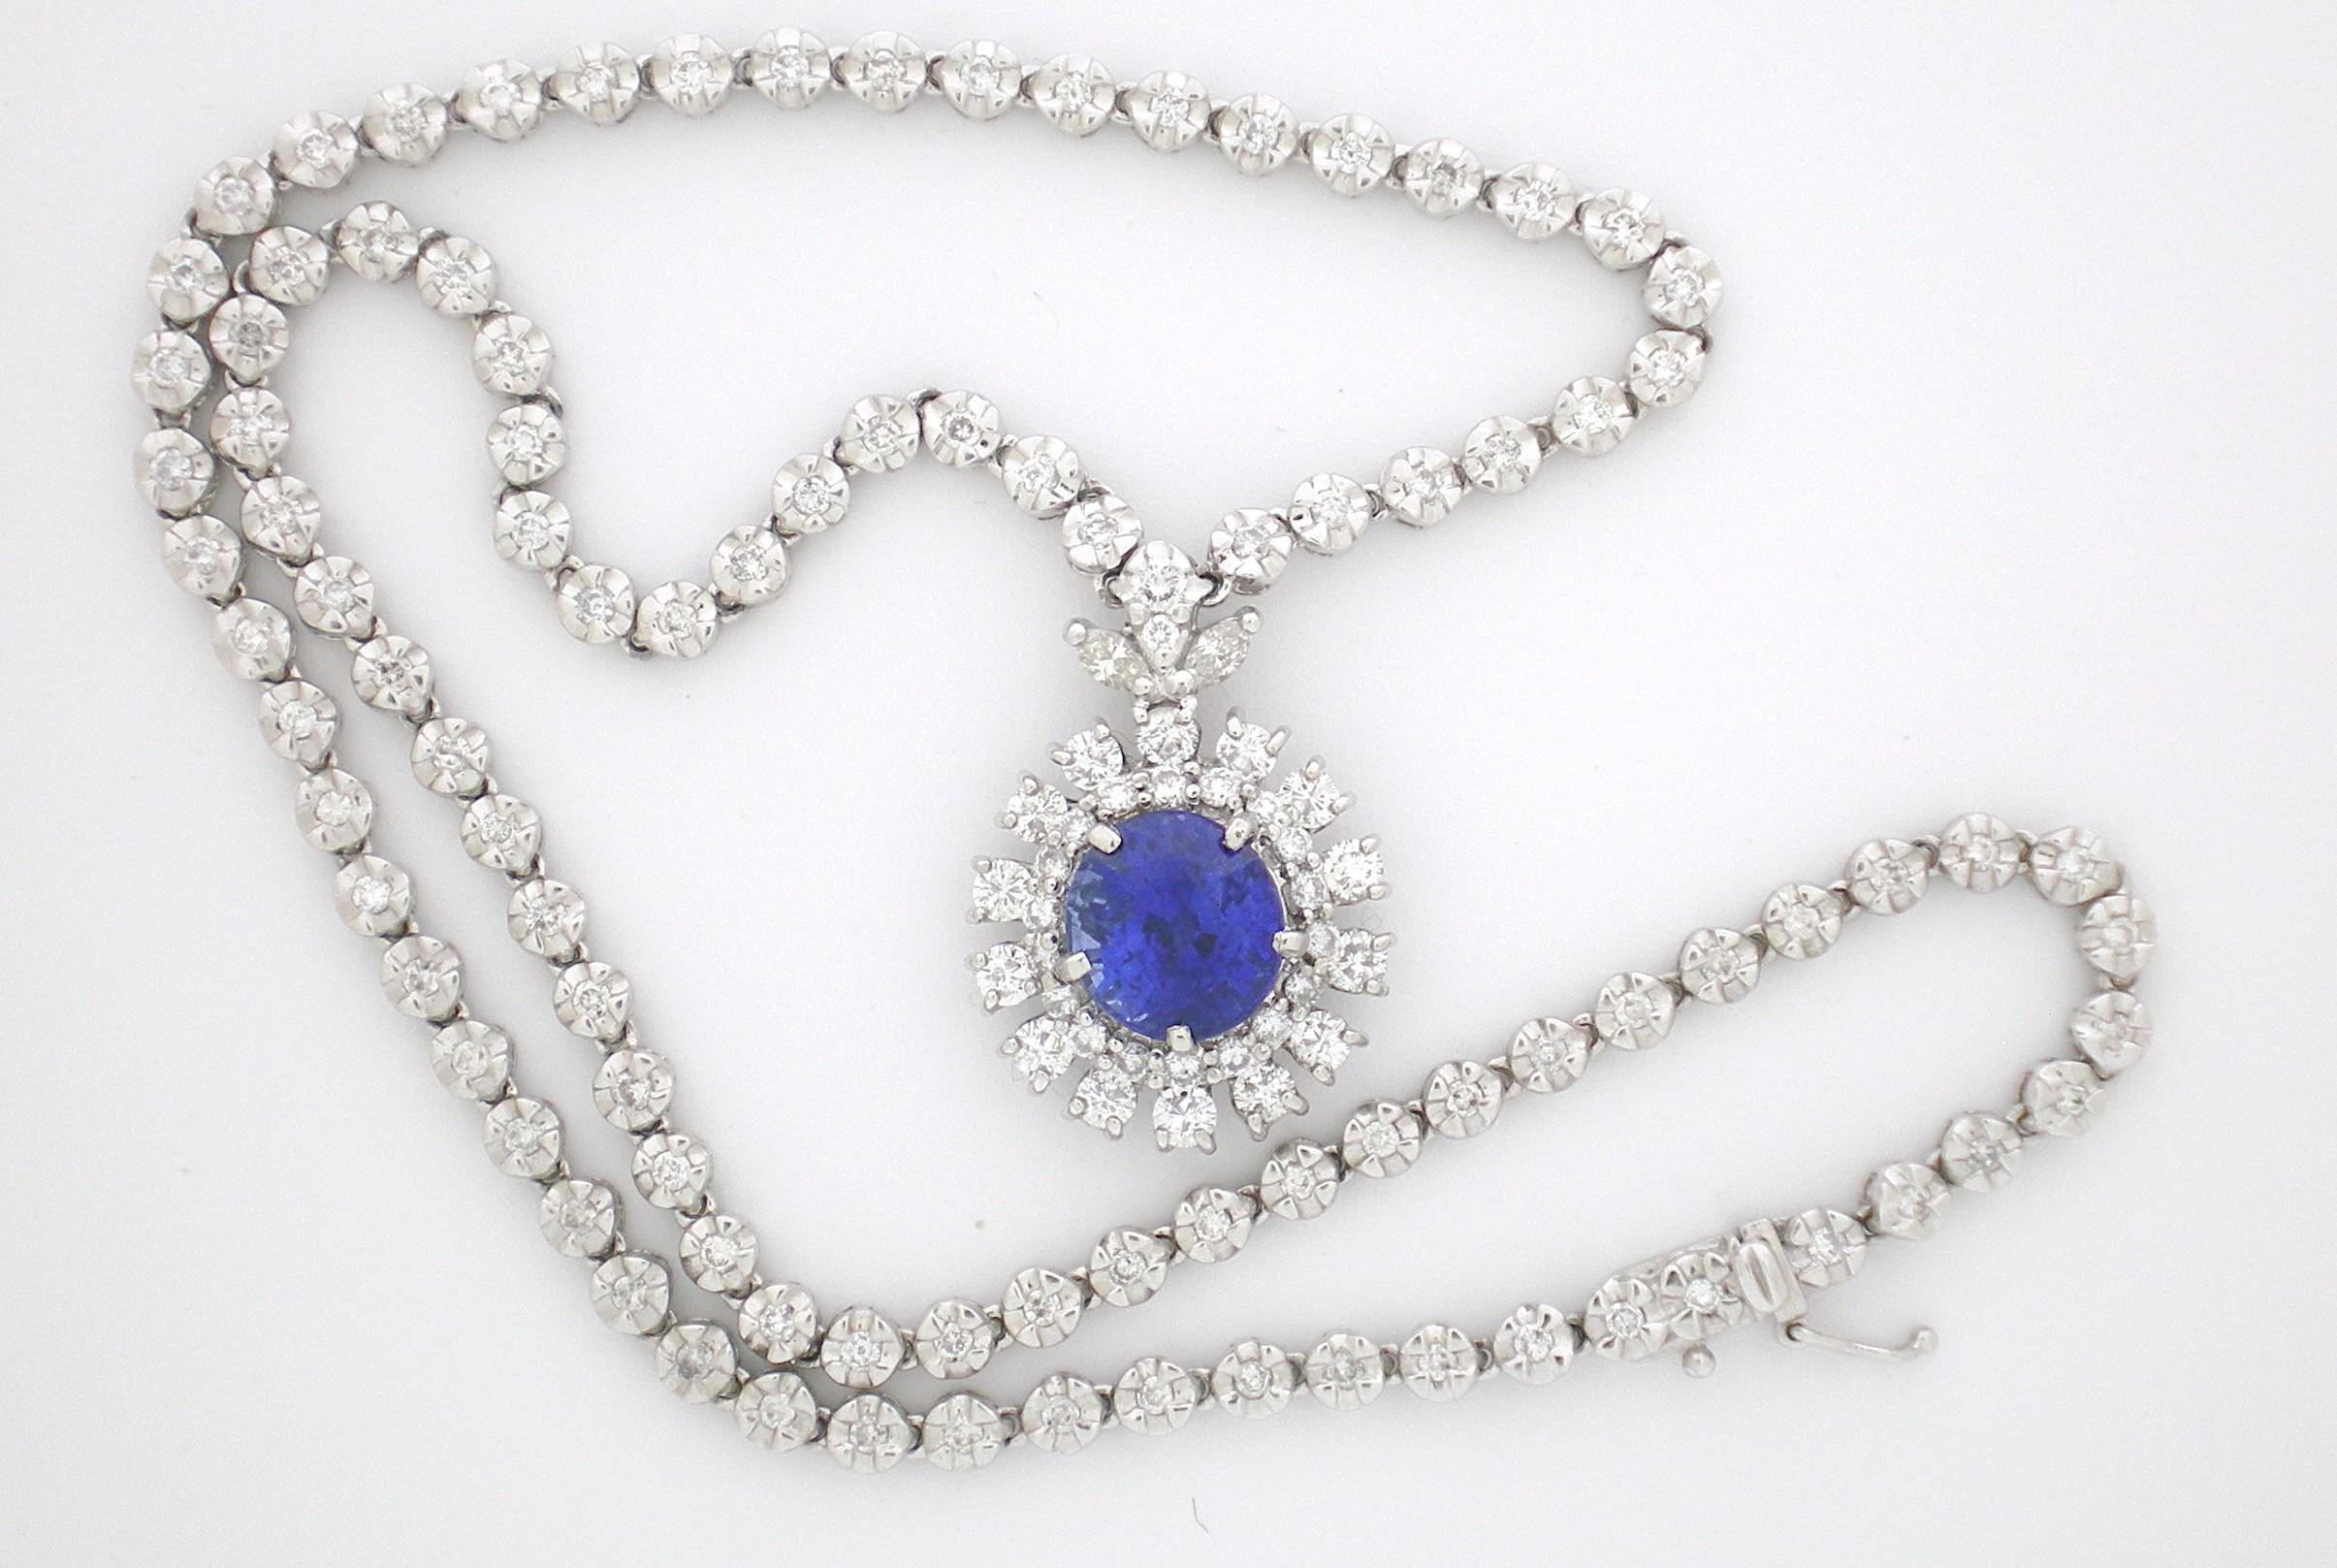 Cambridge Jewelry & Watch Buyers in Boston, MA